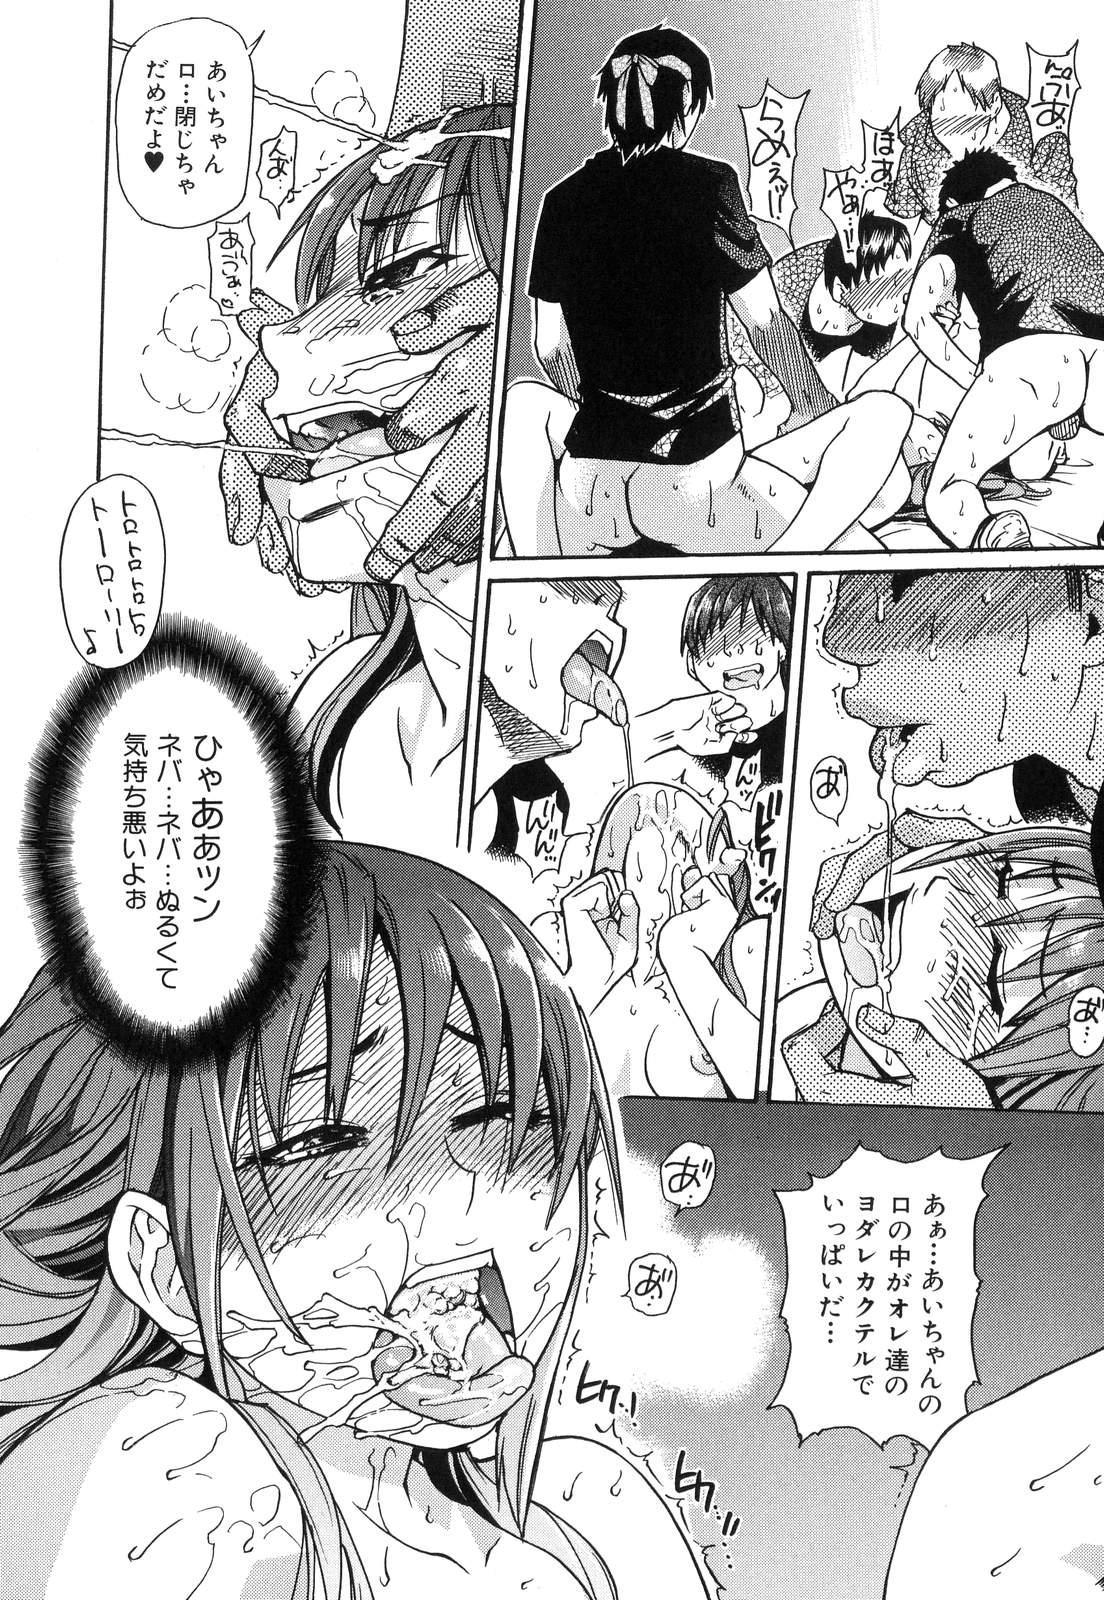 Shining Musume. 6. Rainbow Six 129